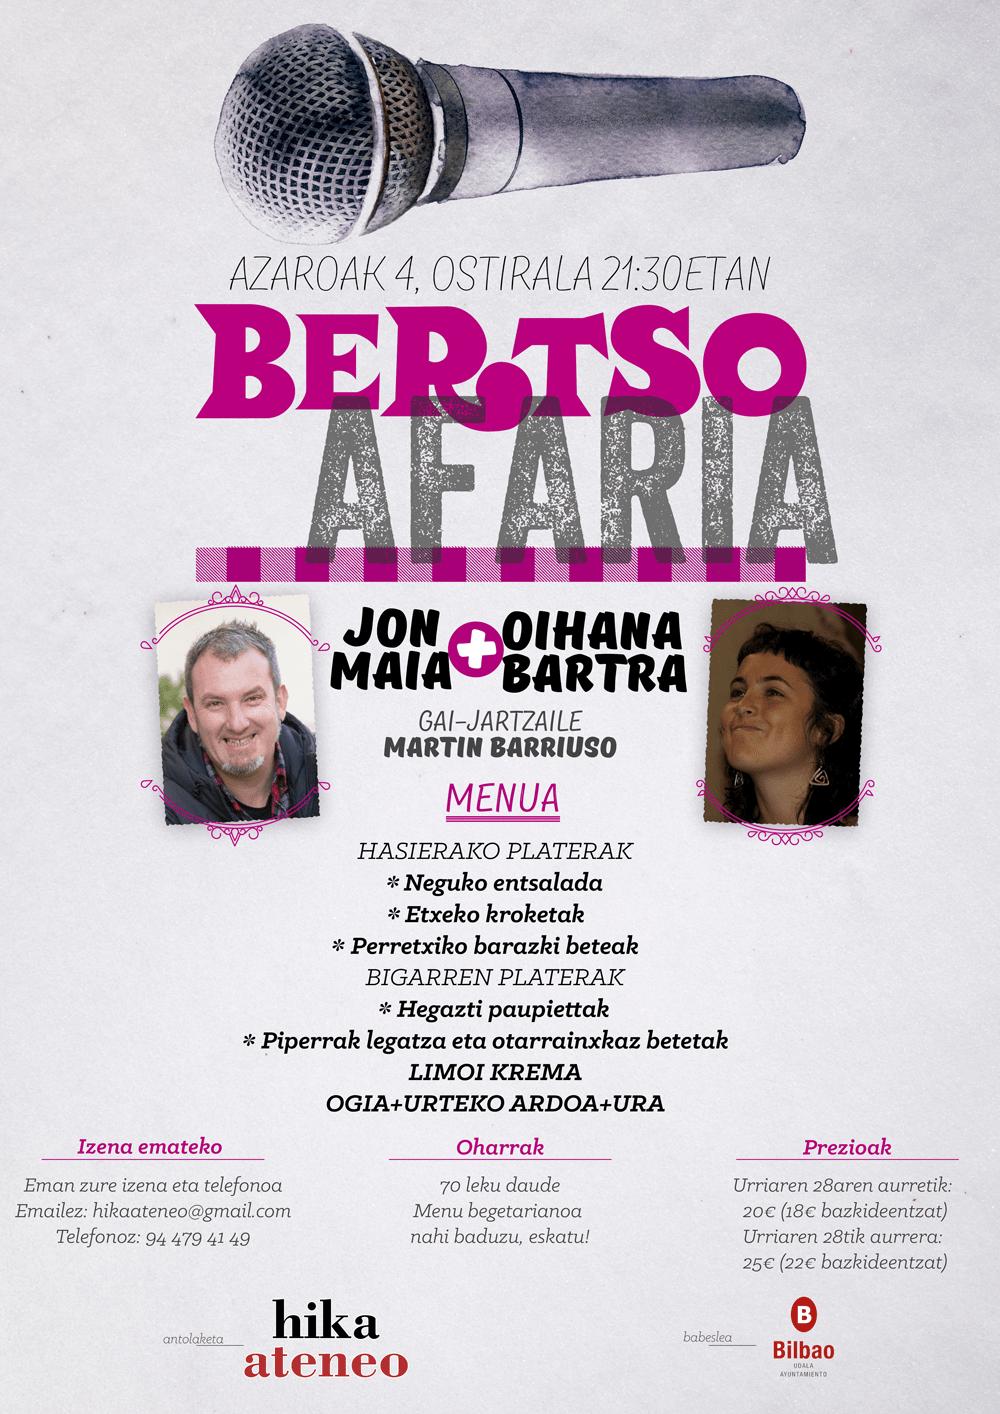 bertsoafaria Hika Ateneo Bilbao 2016